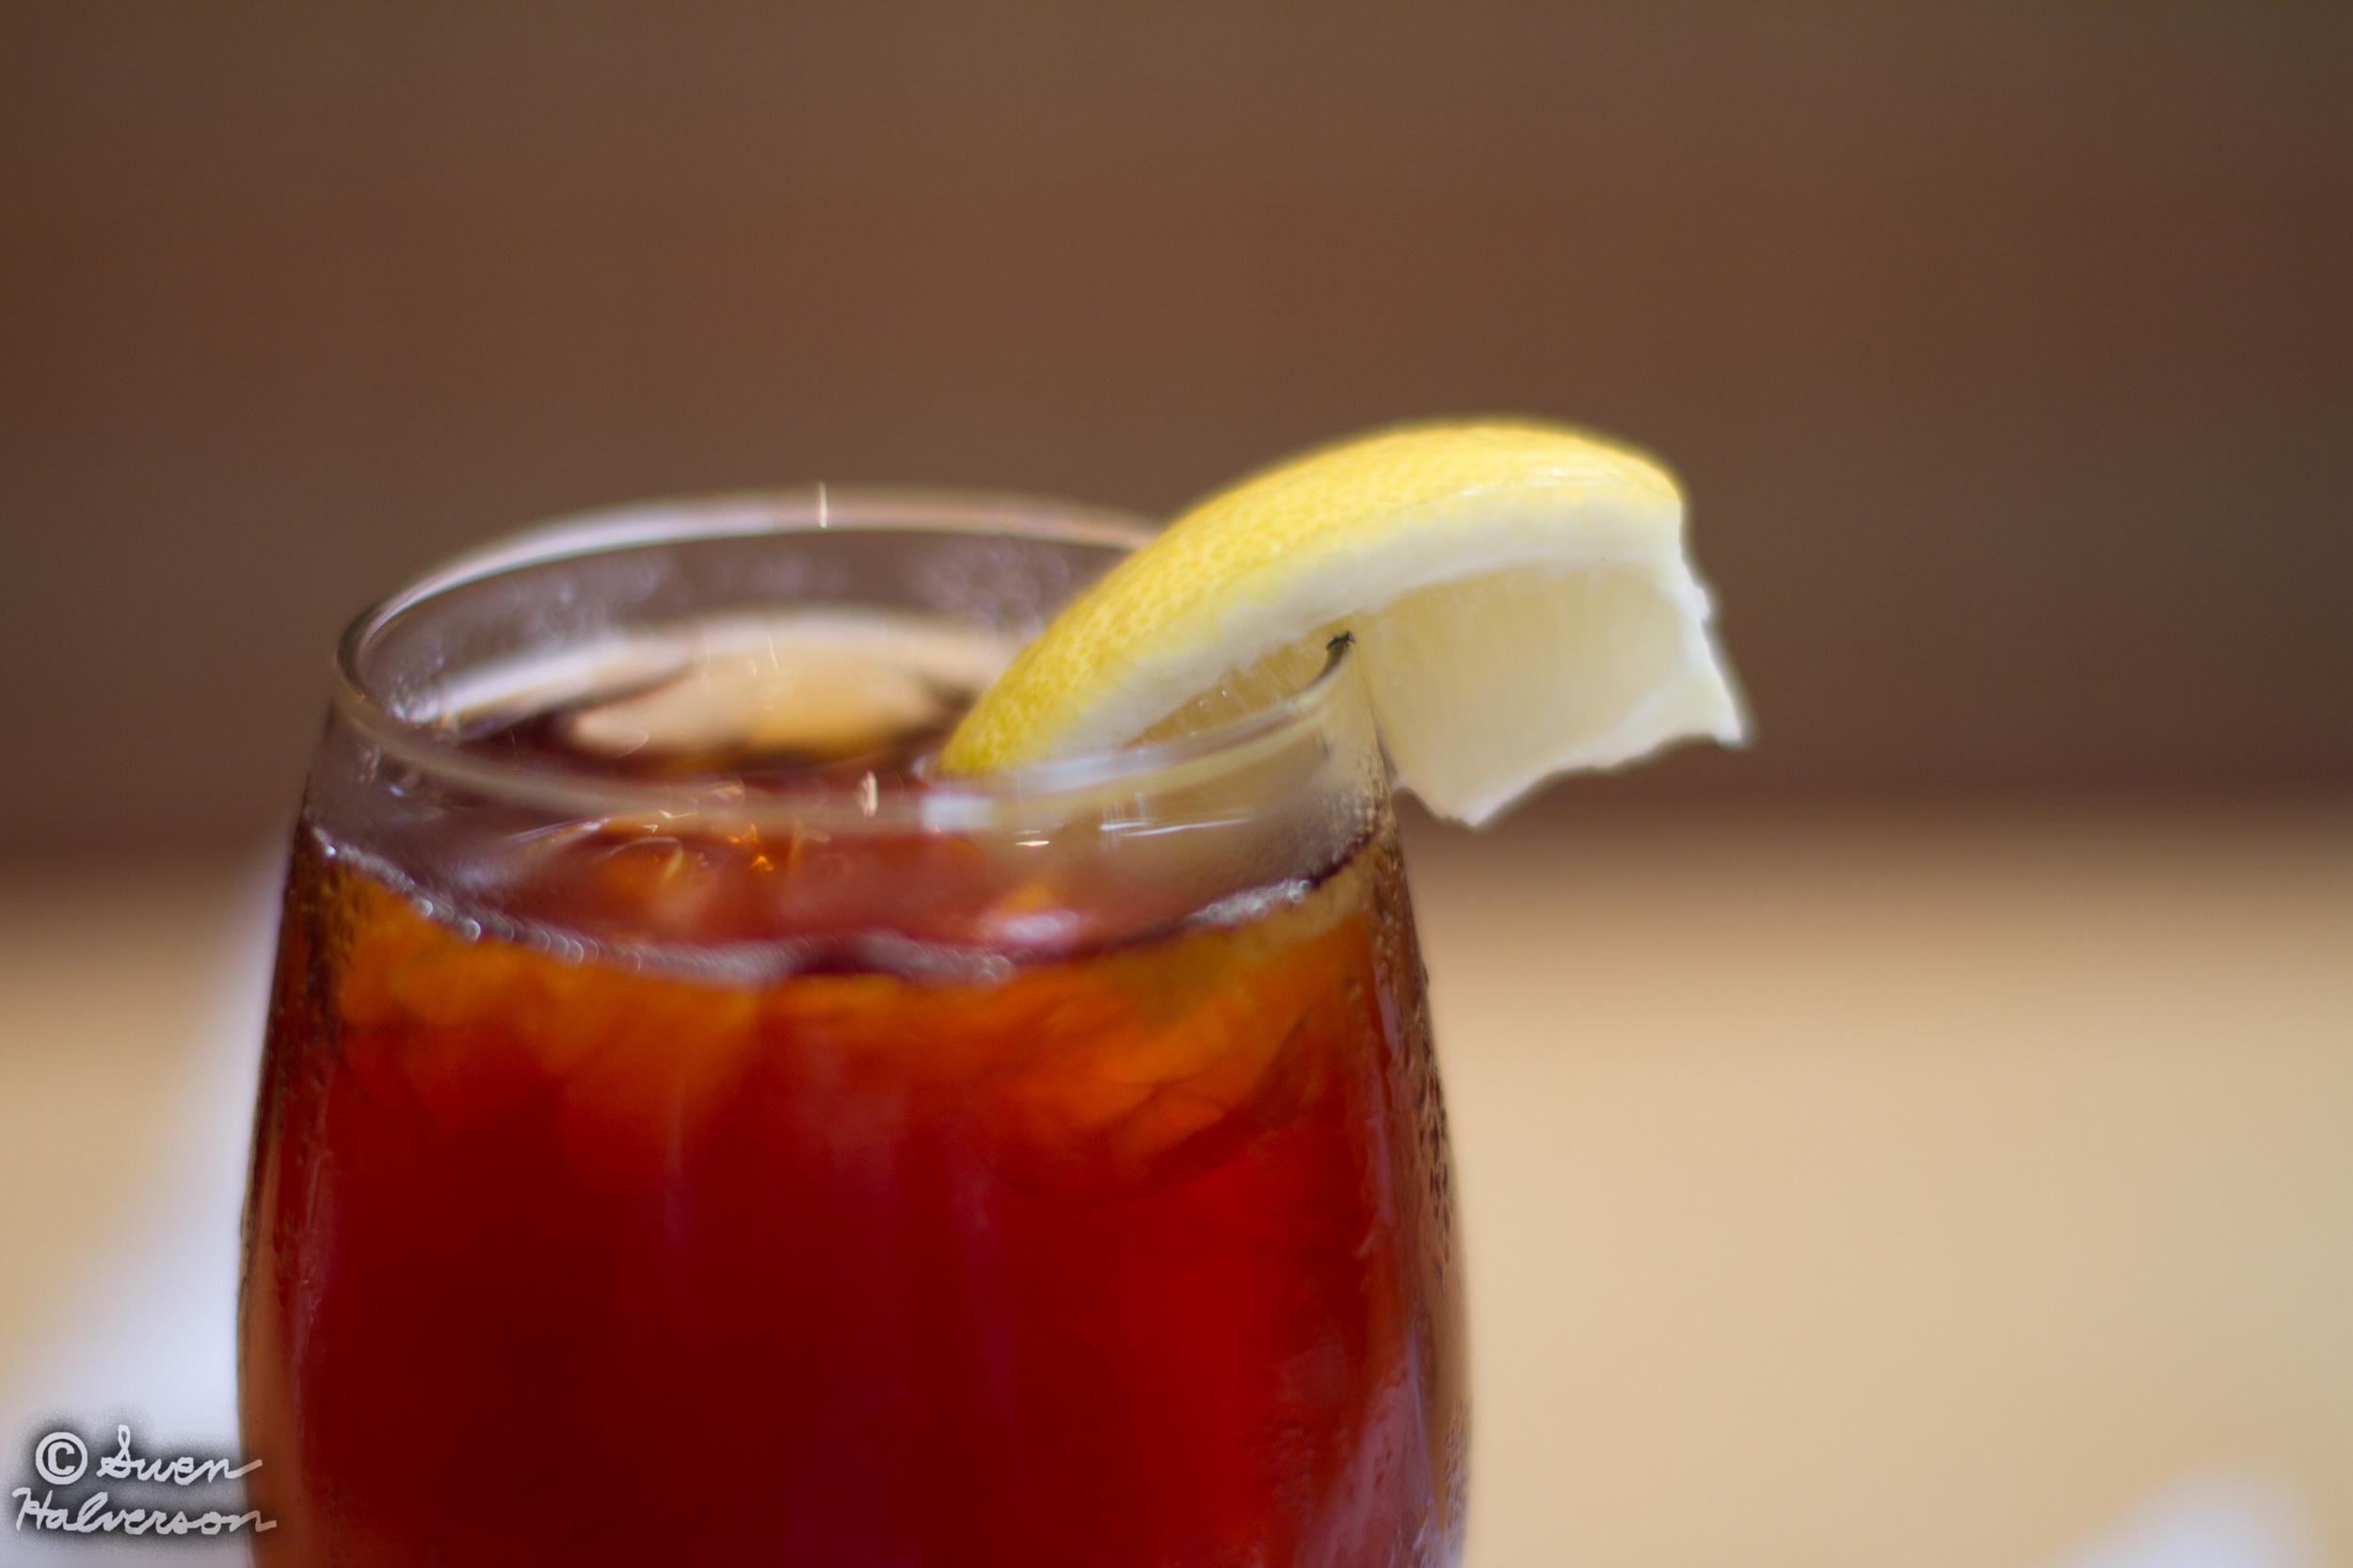 Theme: Liquid <br>Title: Iced Tea